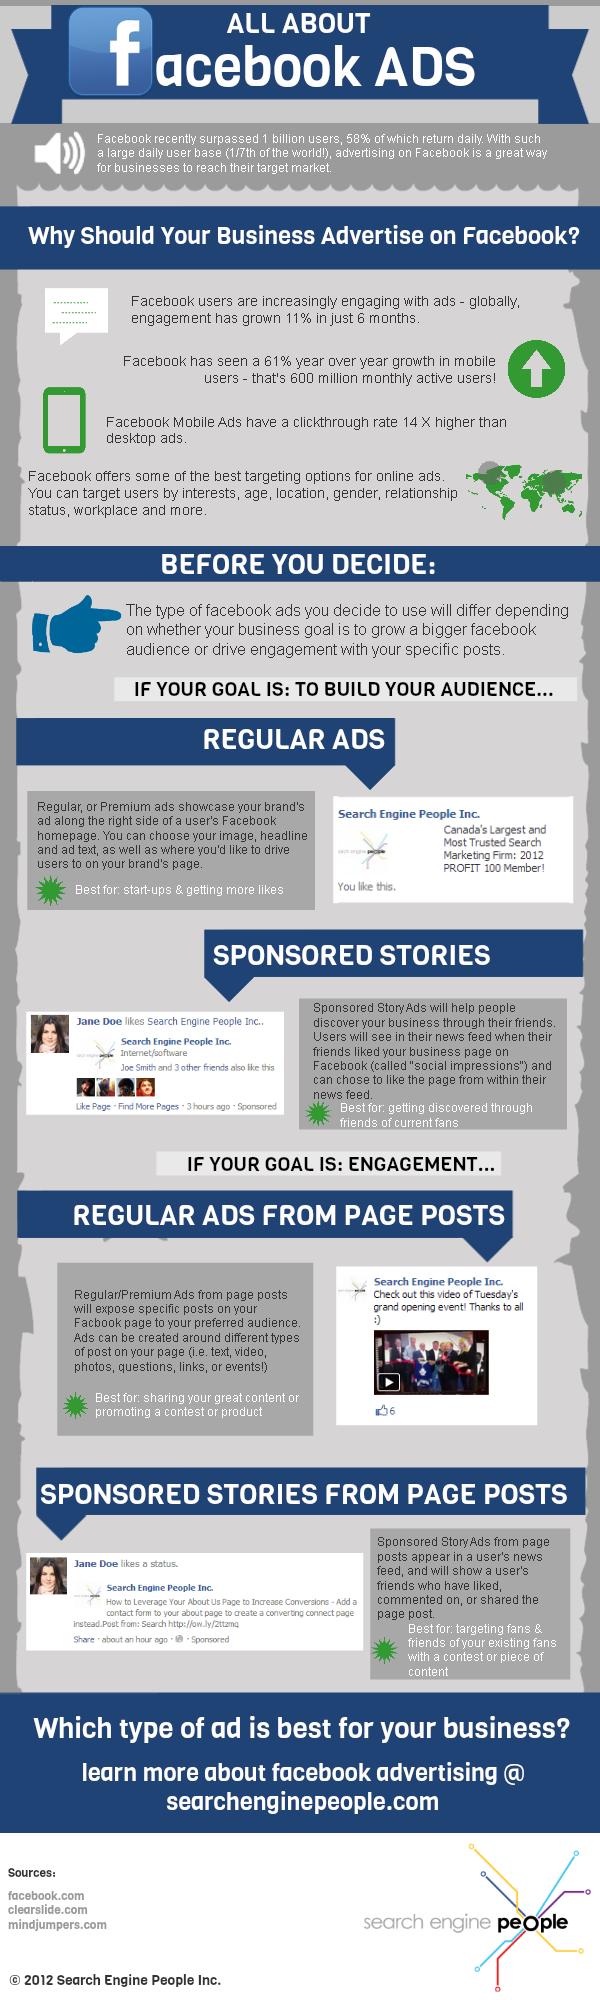 Fan Page Money Method 2015 | Facebook Marketing Strategies